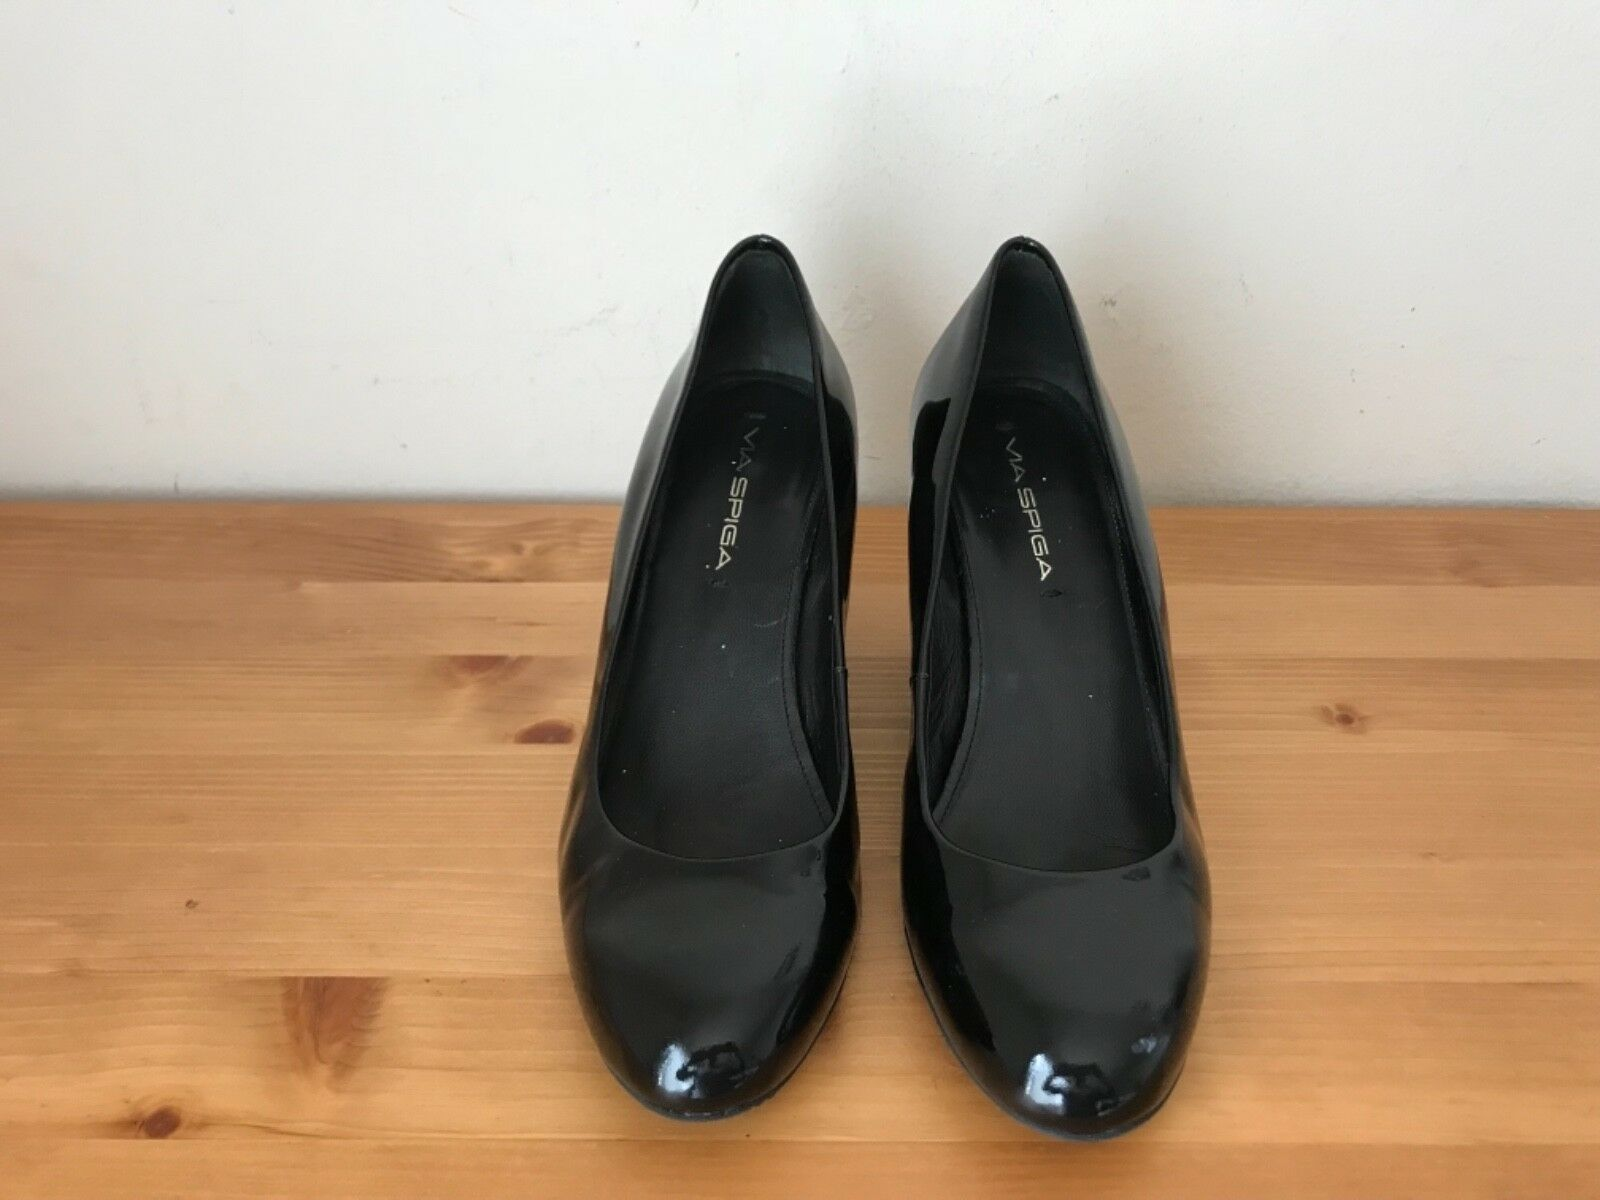 a2e2da4557b VIA SPIGA black patent leather wedge pumps sz 7M shoes ntmunr1178 ...